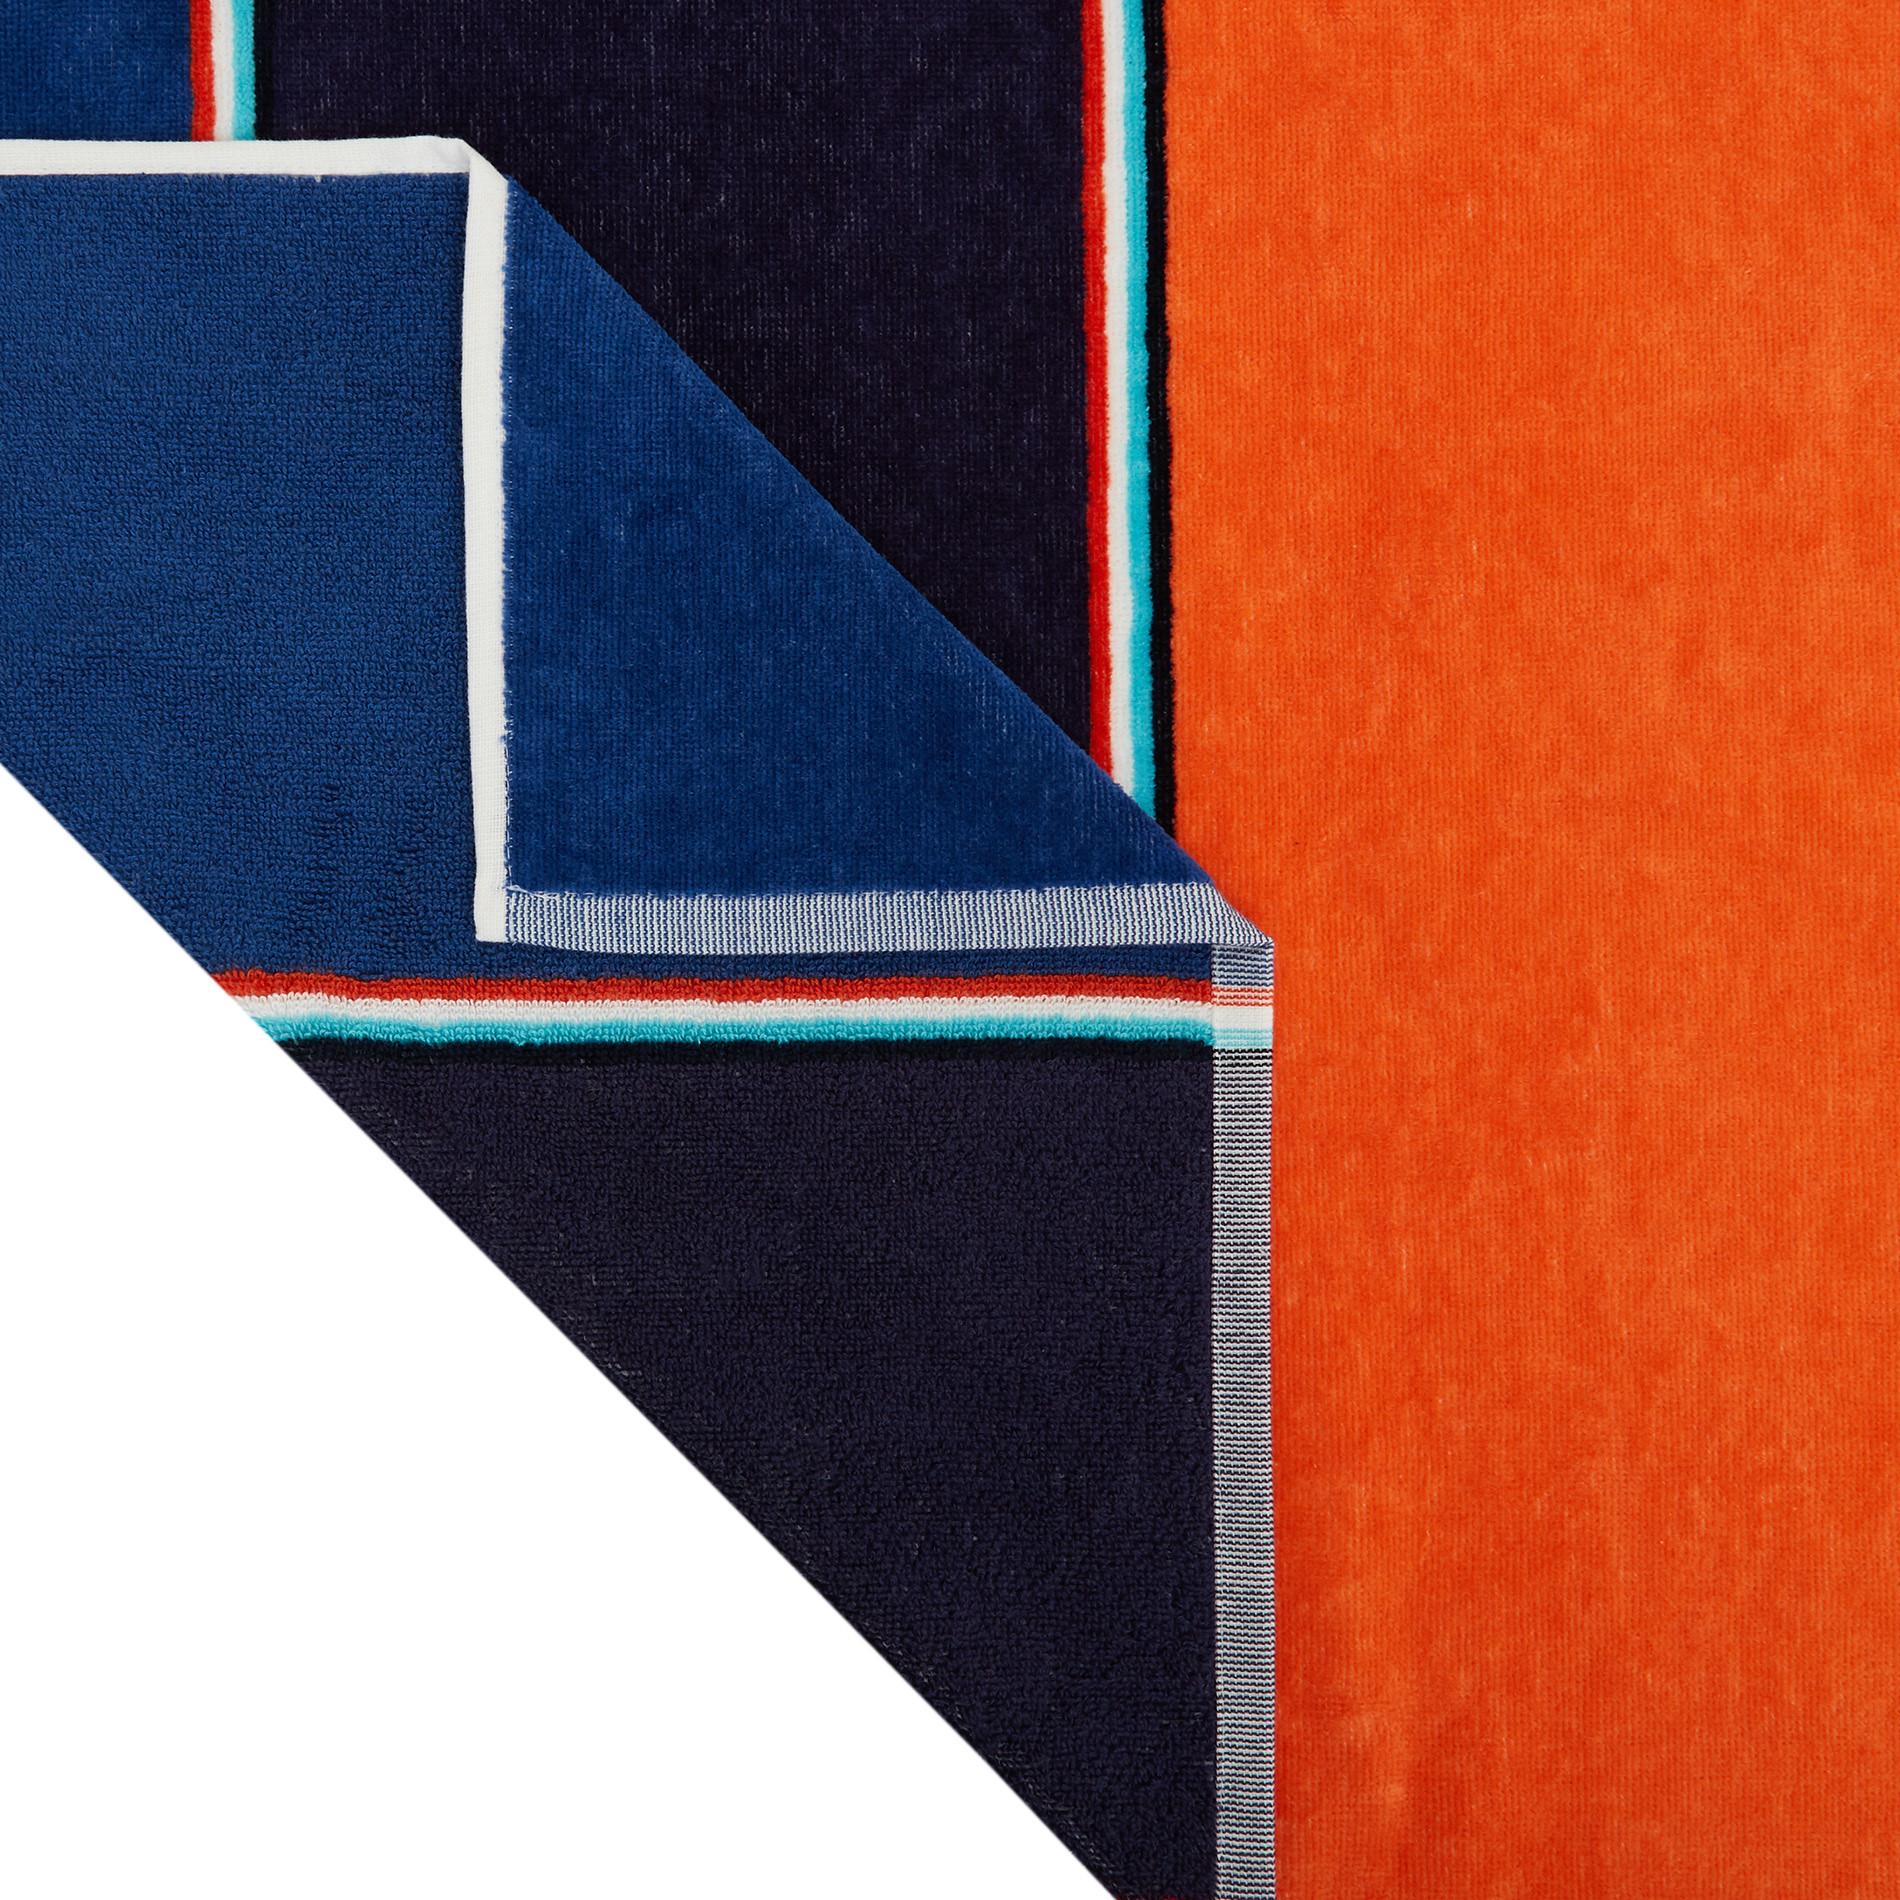 Telo mare cotone velour stampa a righe multicolore, Multicolor, large image number 1